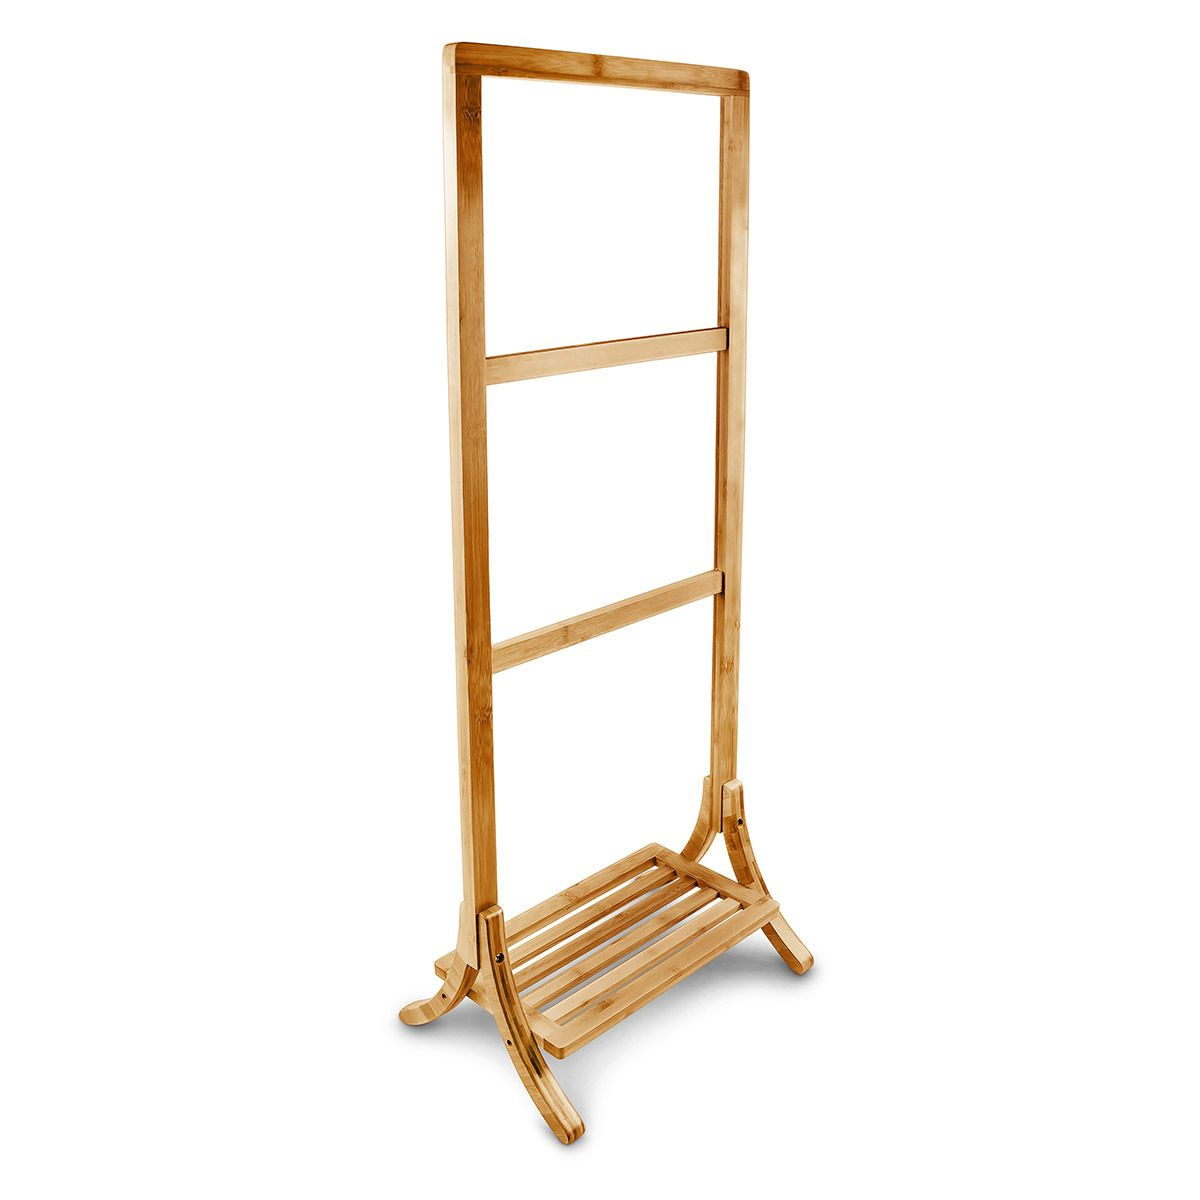 Handtuchhalter Ständer handtuchhalter bambus handtuchhalter ständer und bambus